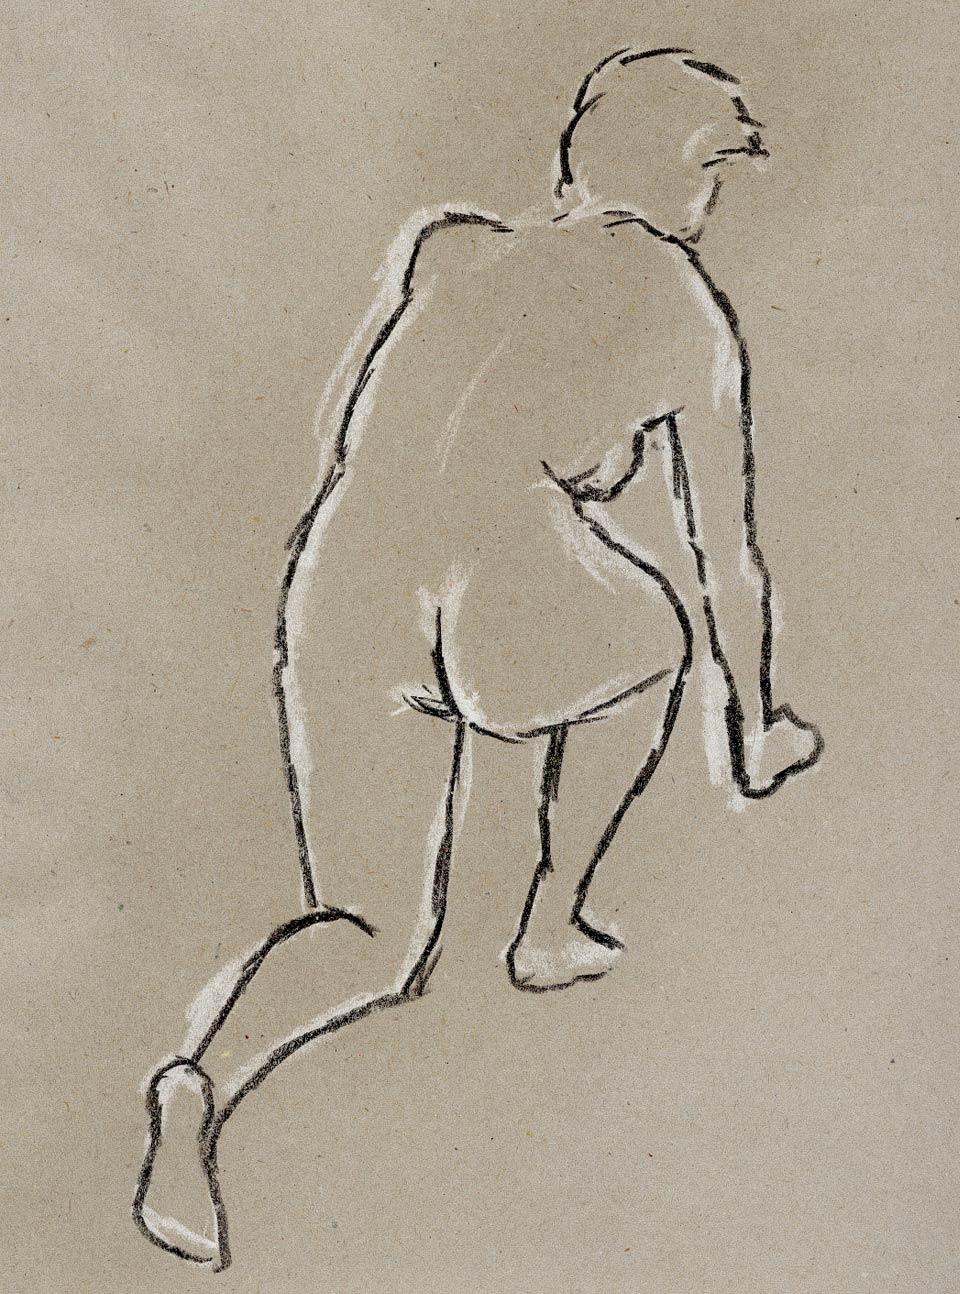 Illustration Croquis Kent Laursen eksperimenter og teknikker kridt